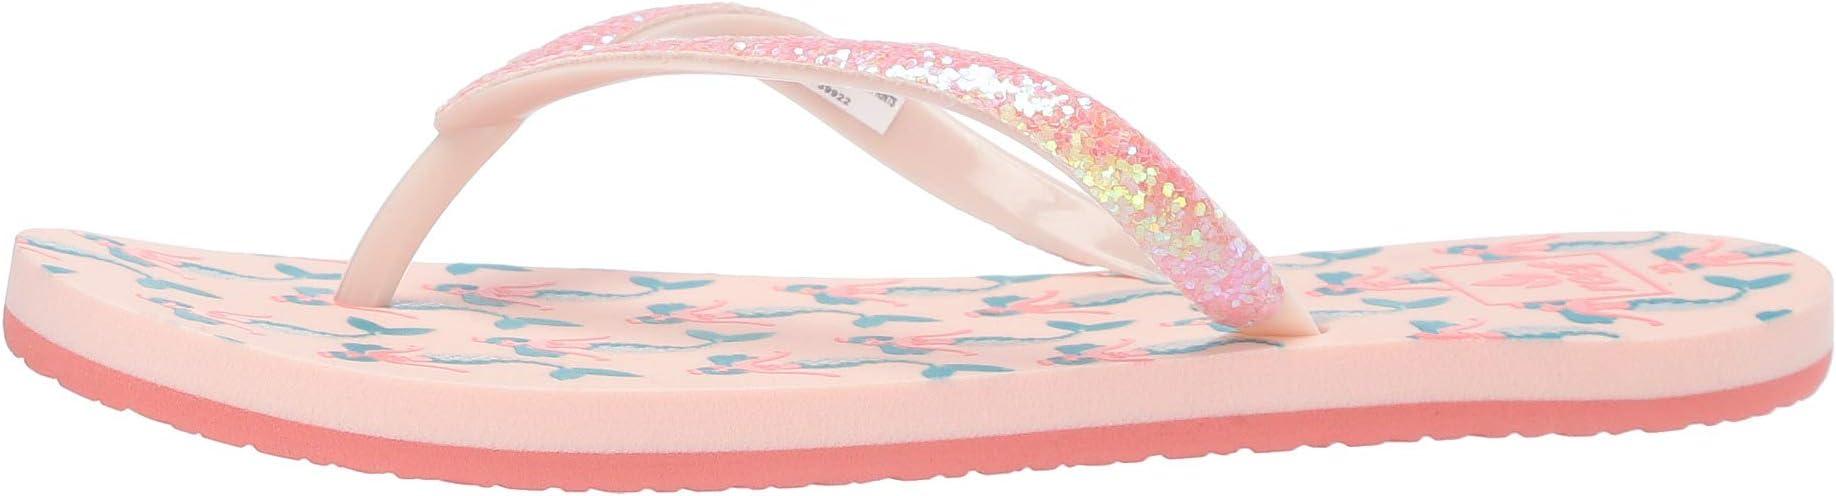 TC-6-girls-sandals-2020-24-20